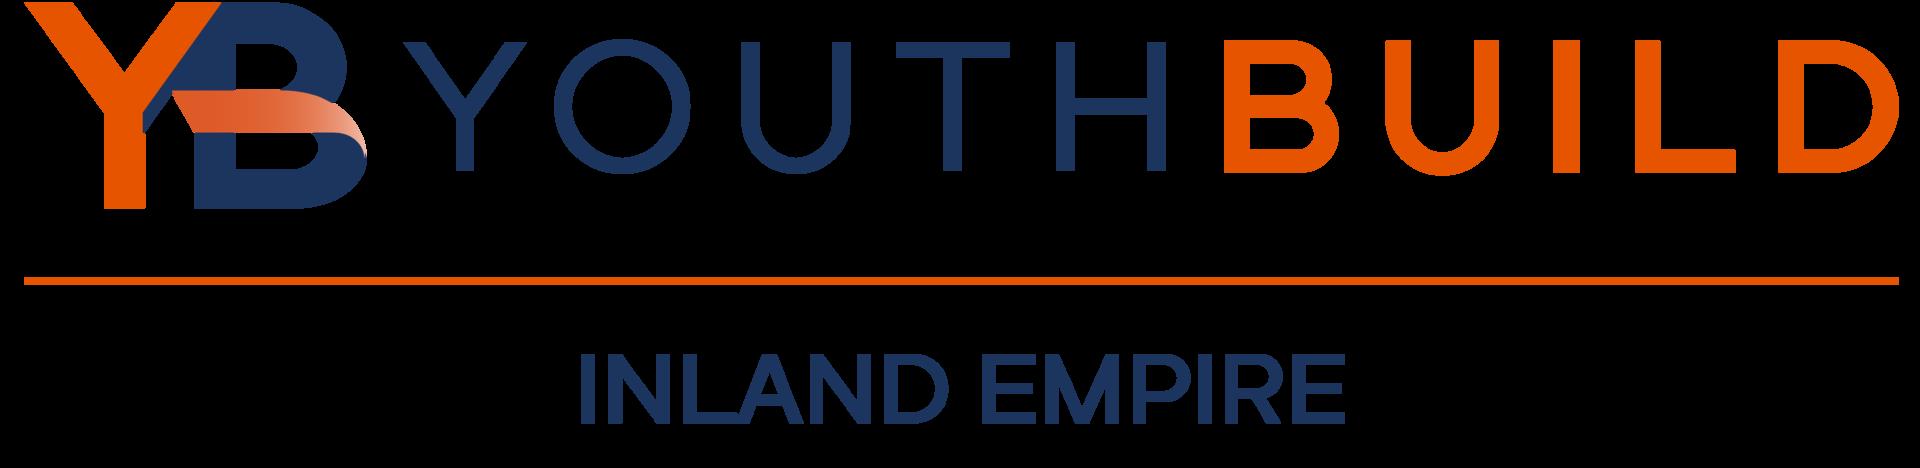 YouthBuild Inland Empire logo